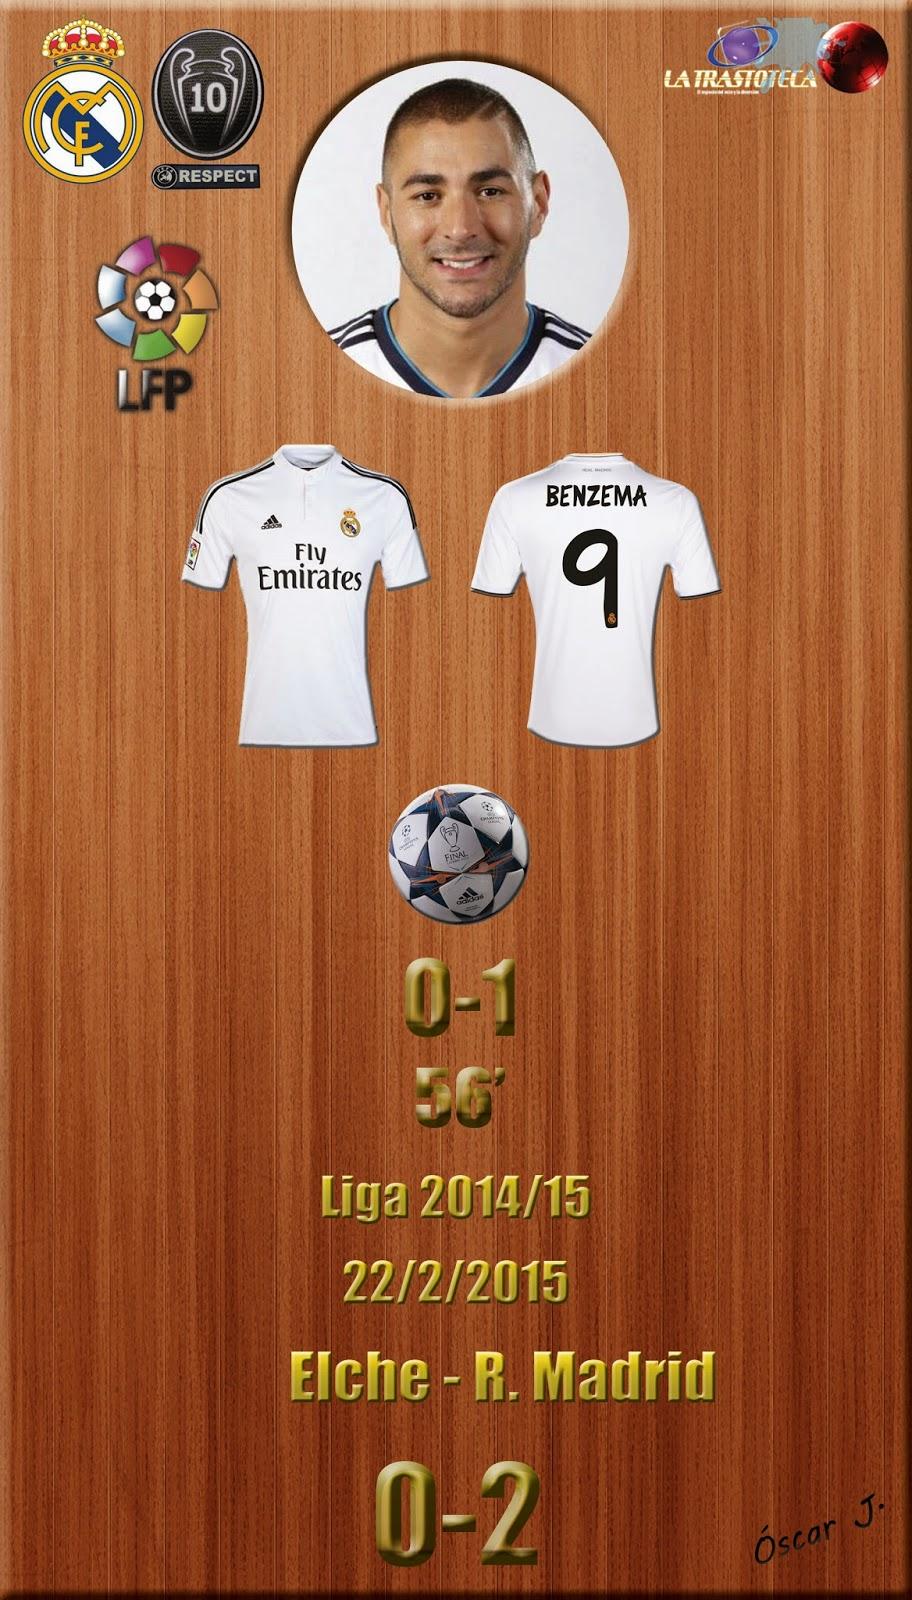 Benzema (0-1) - Elche 0- 2 Real Madrid - Liga 2014/15 - Jornada 24 - (22/2/2015)